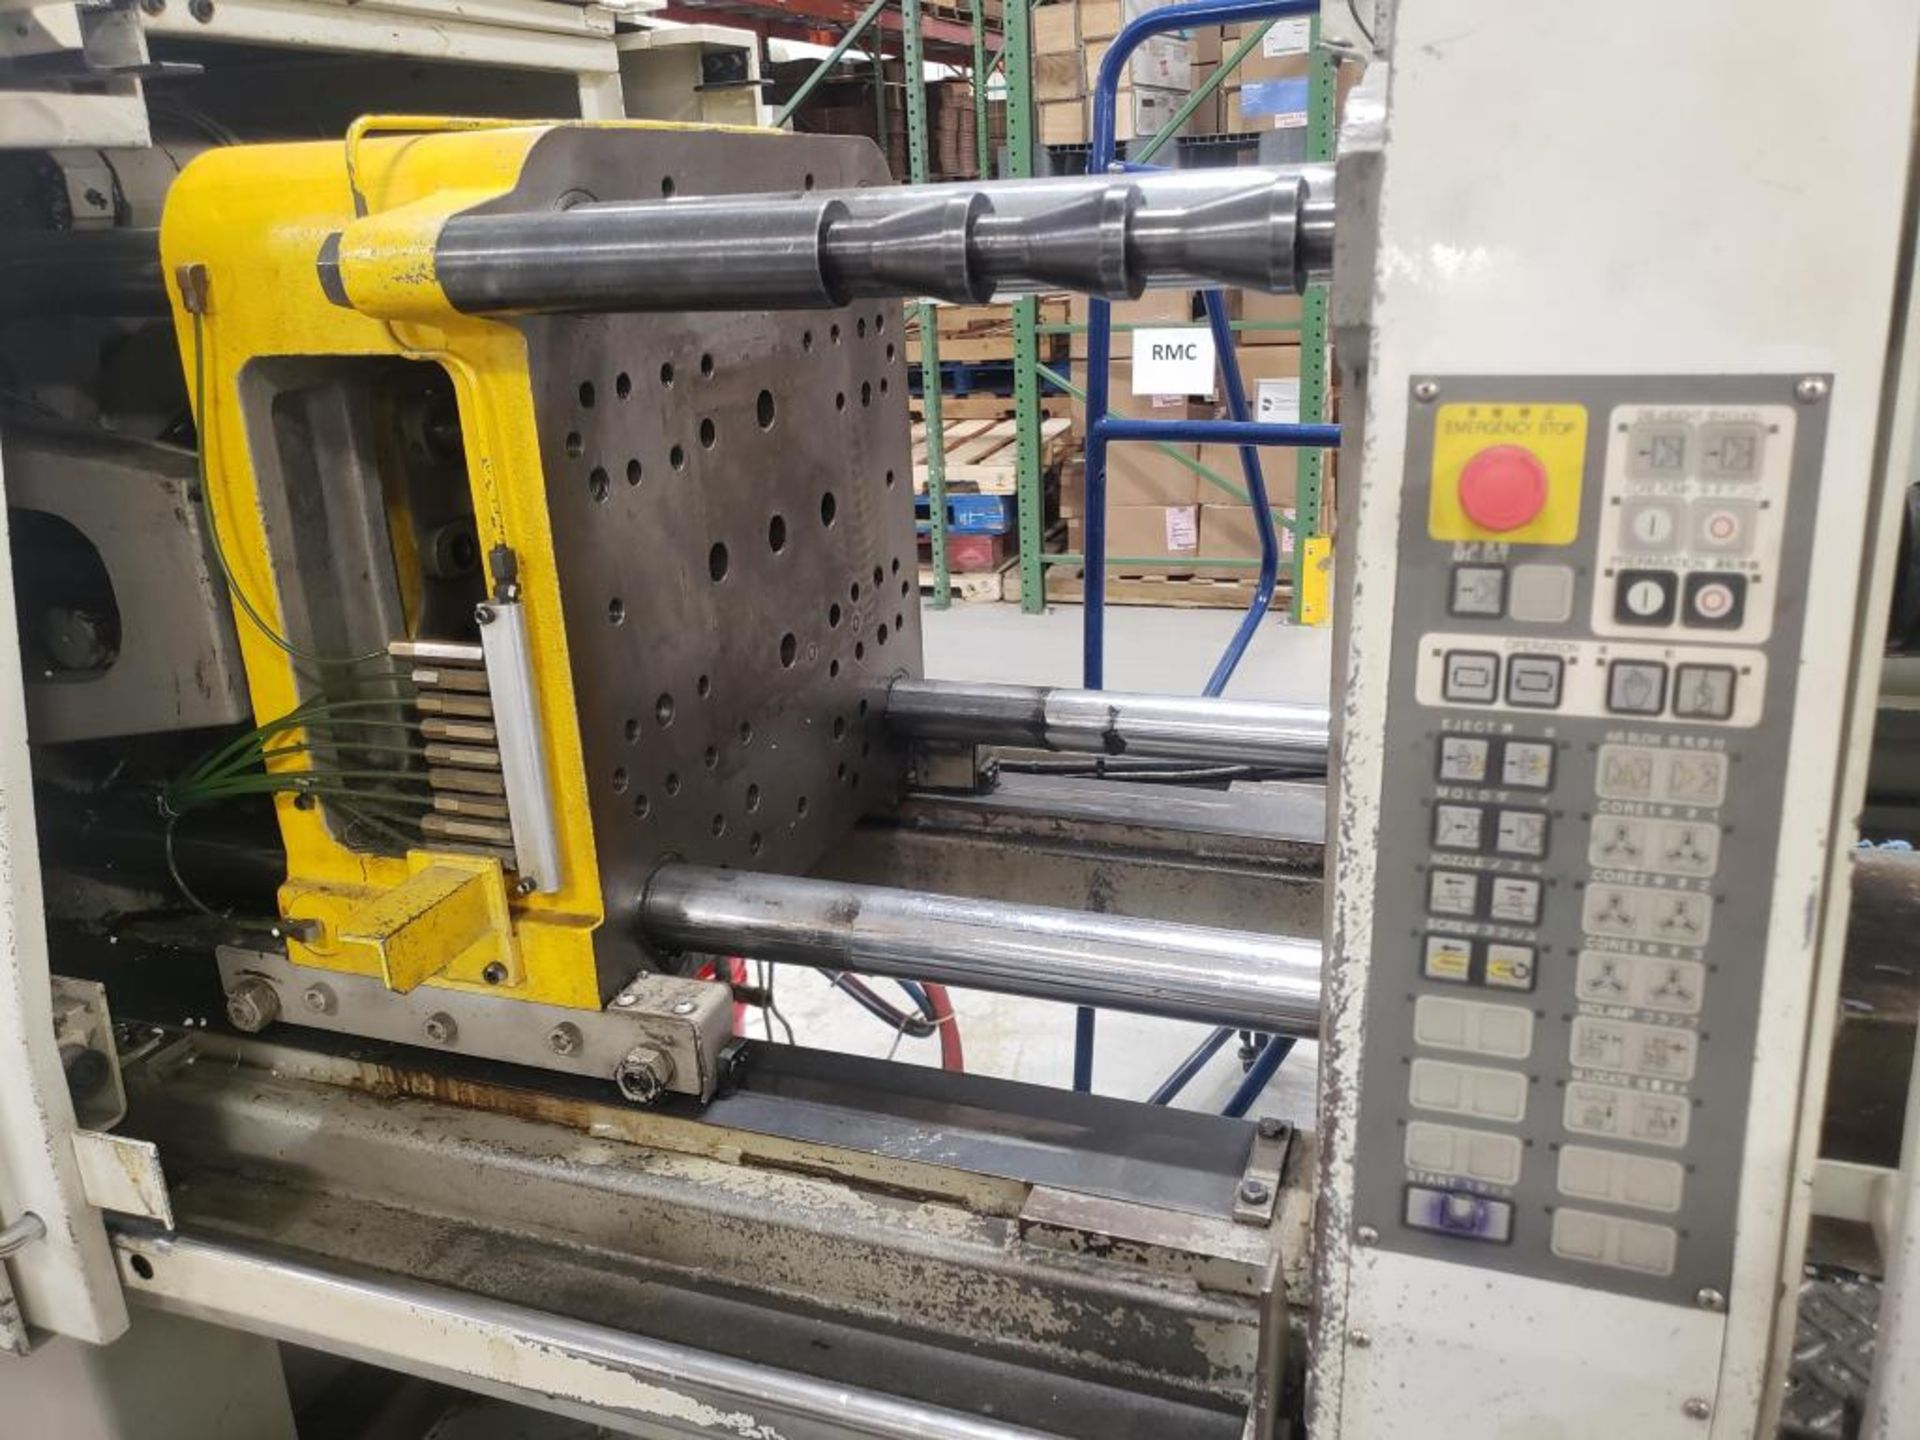 Injection Molding Machine - Image 5 of 7